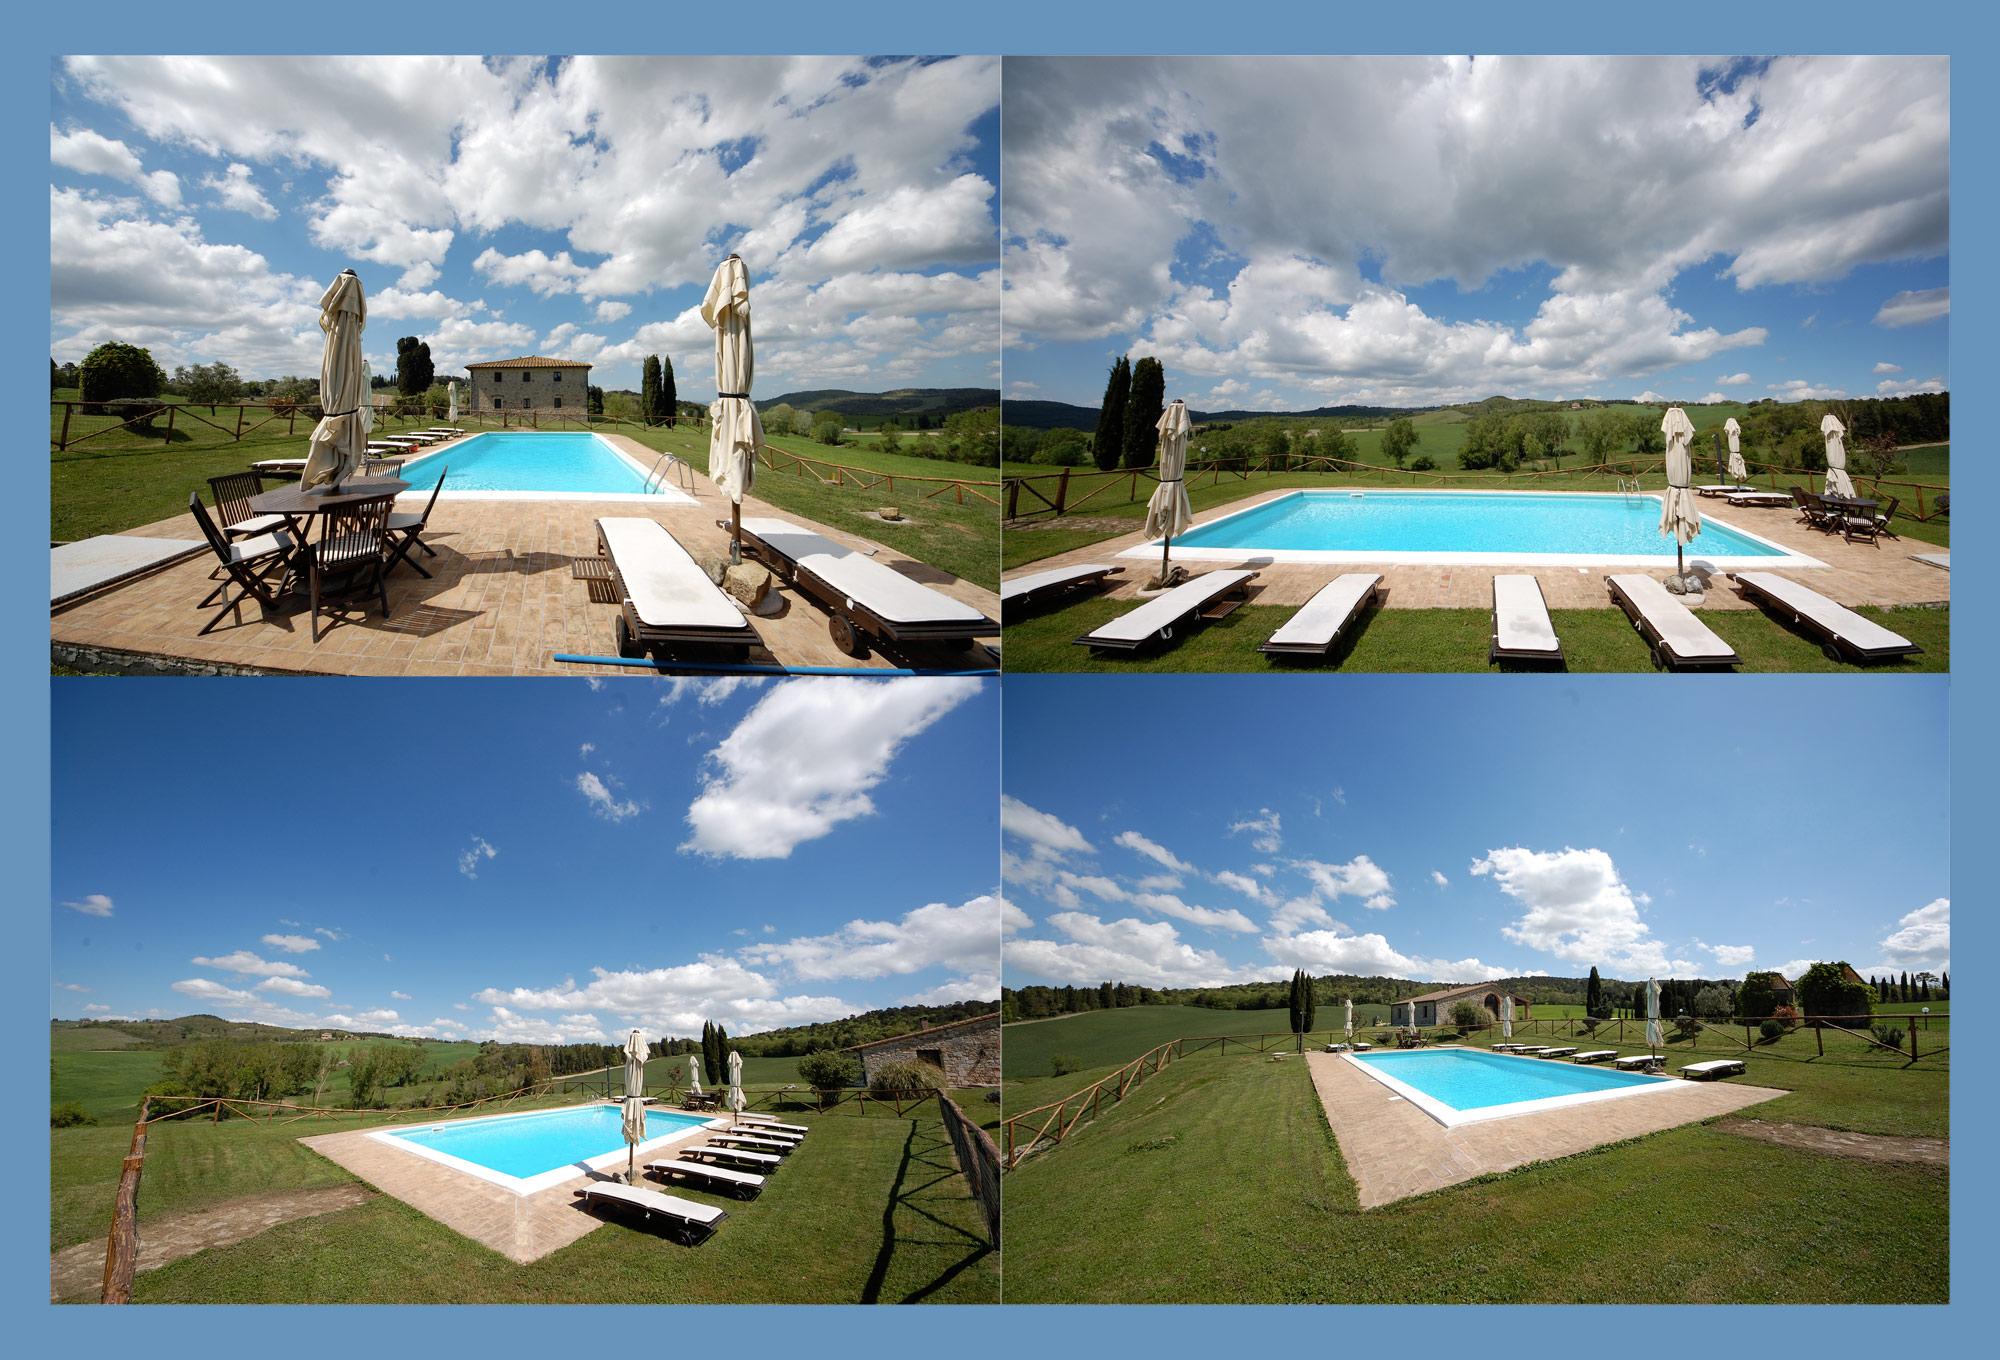 Tuscany-villa-pool